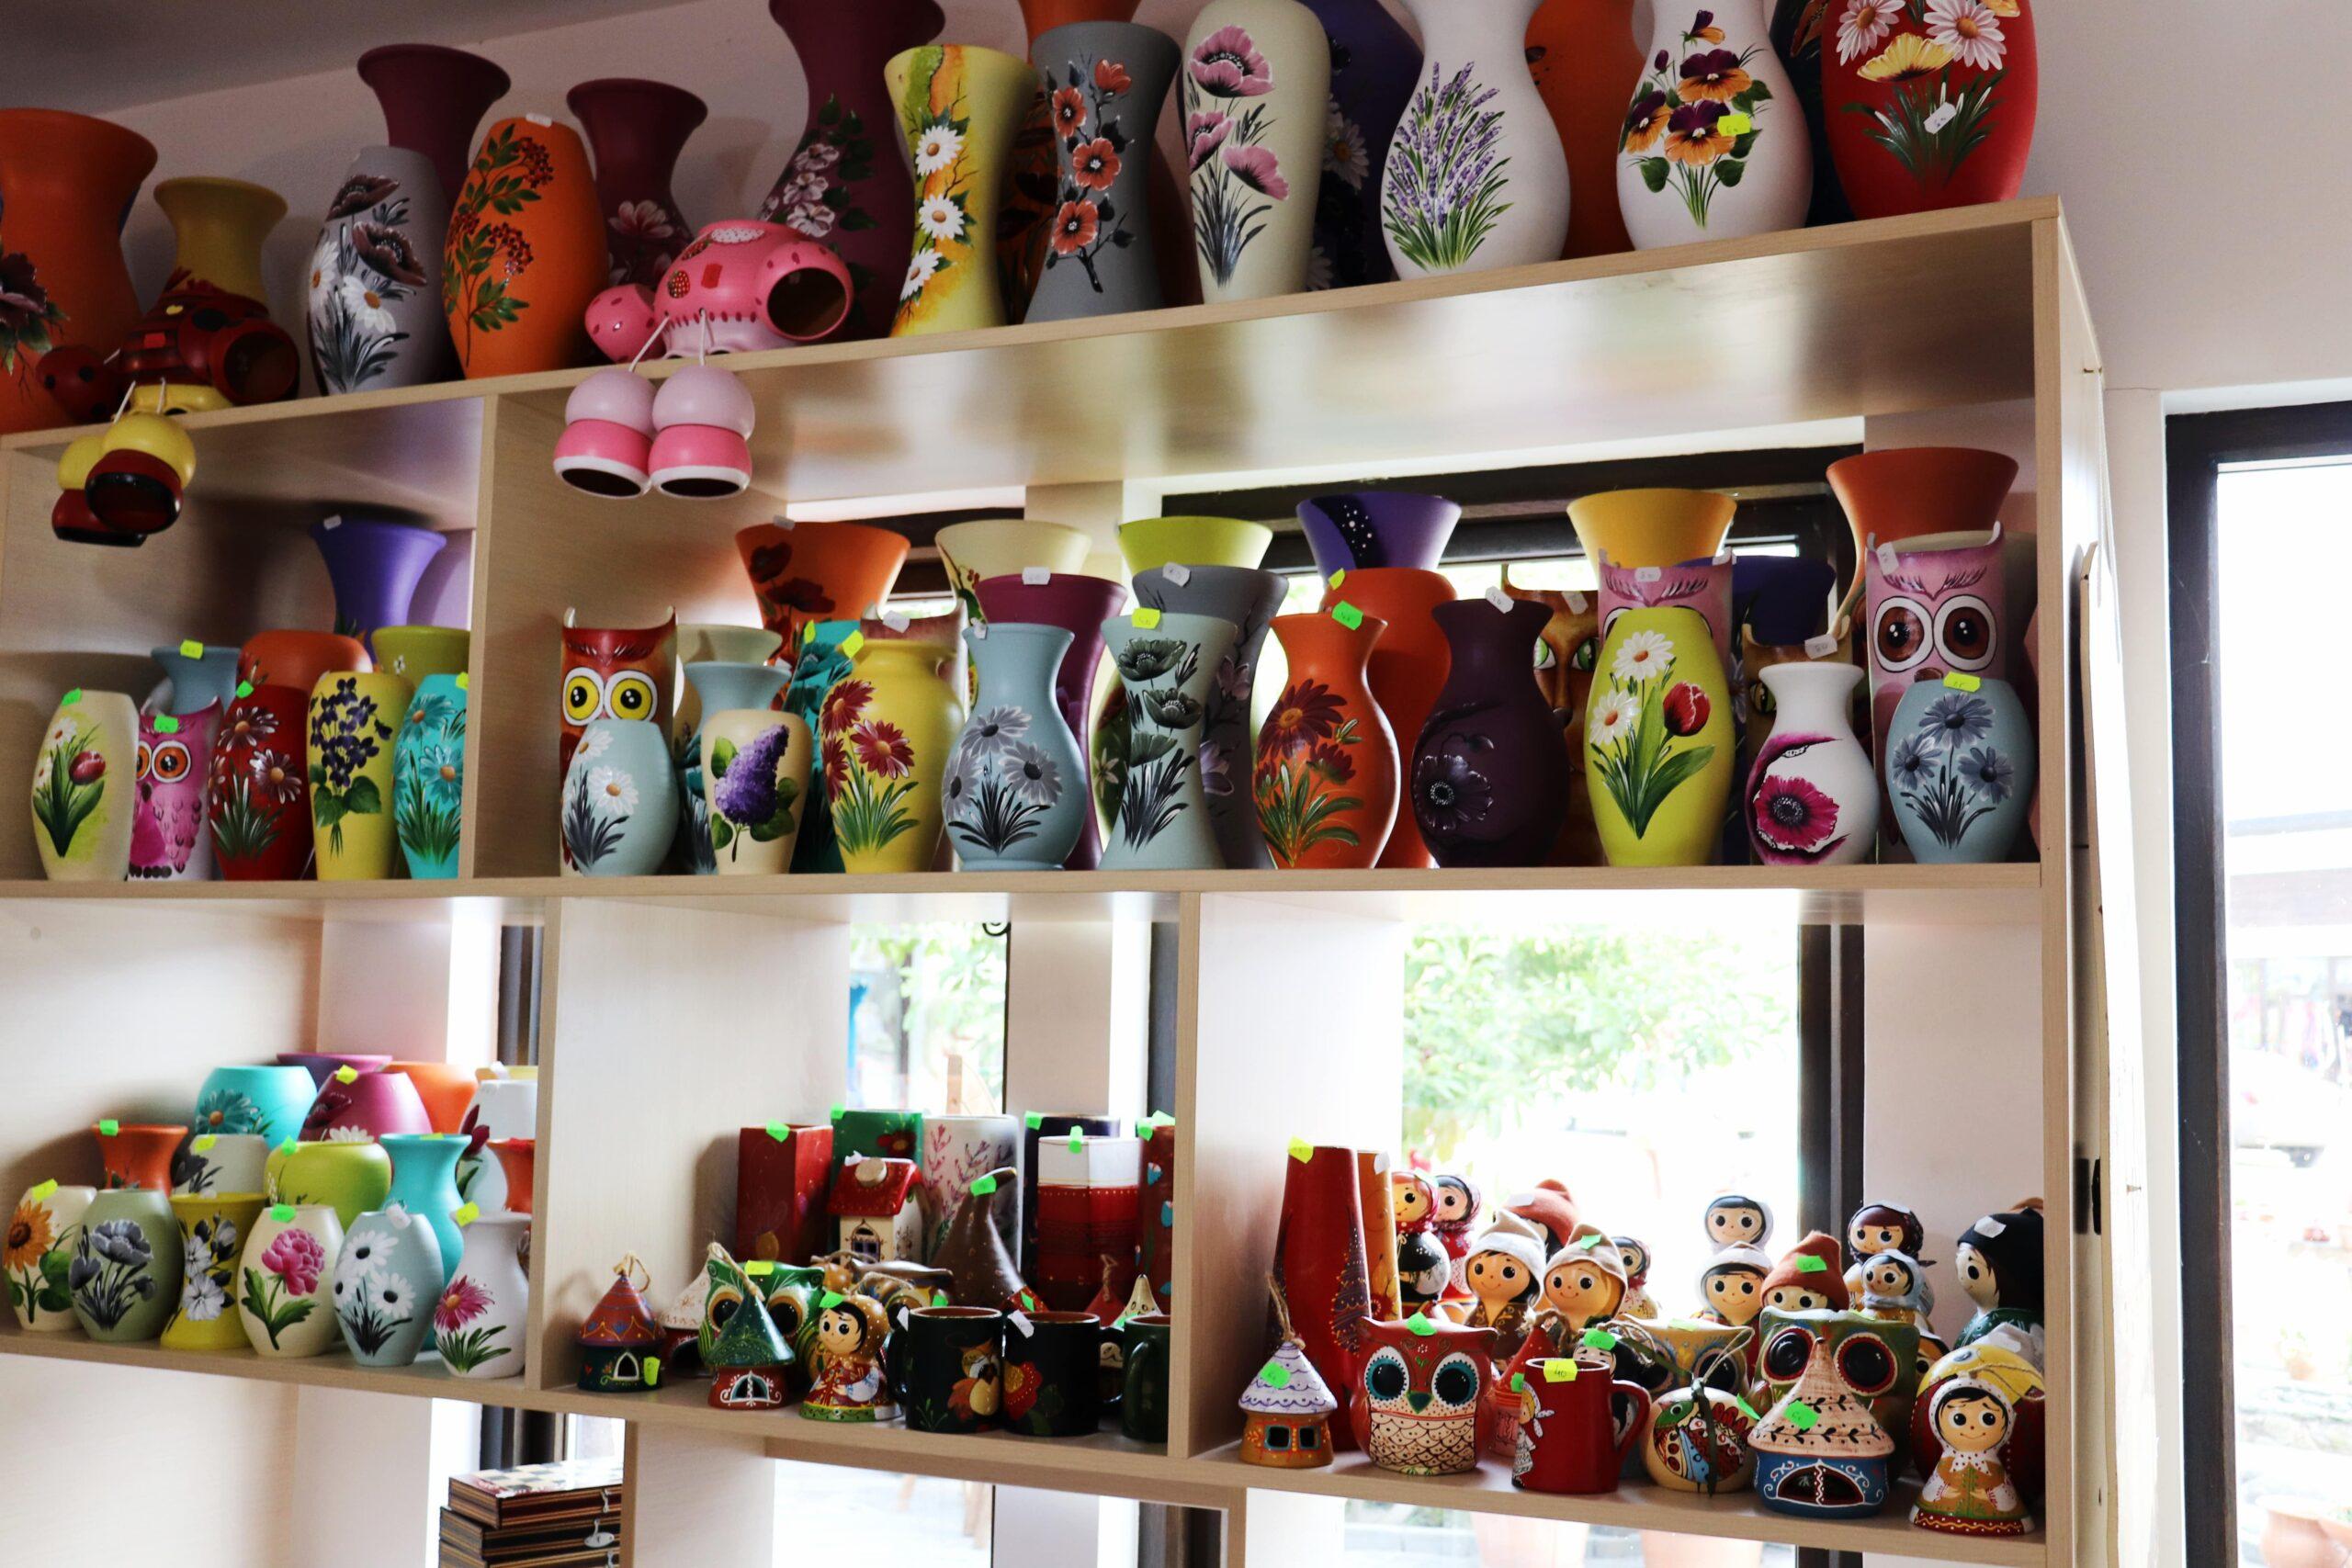 day-trip-horezu-obiecte-decorative-min